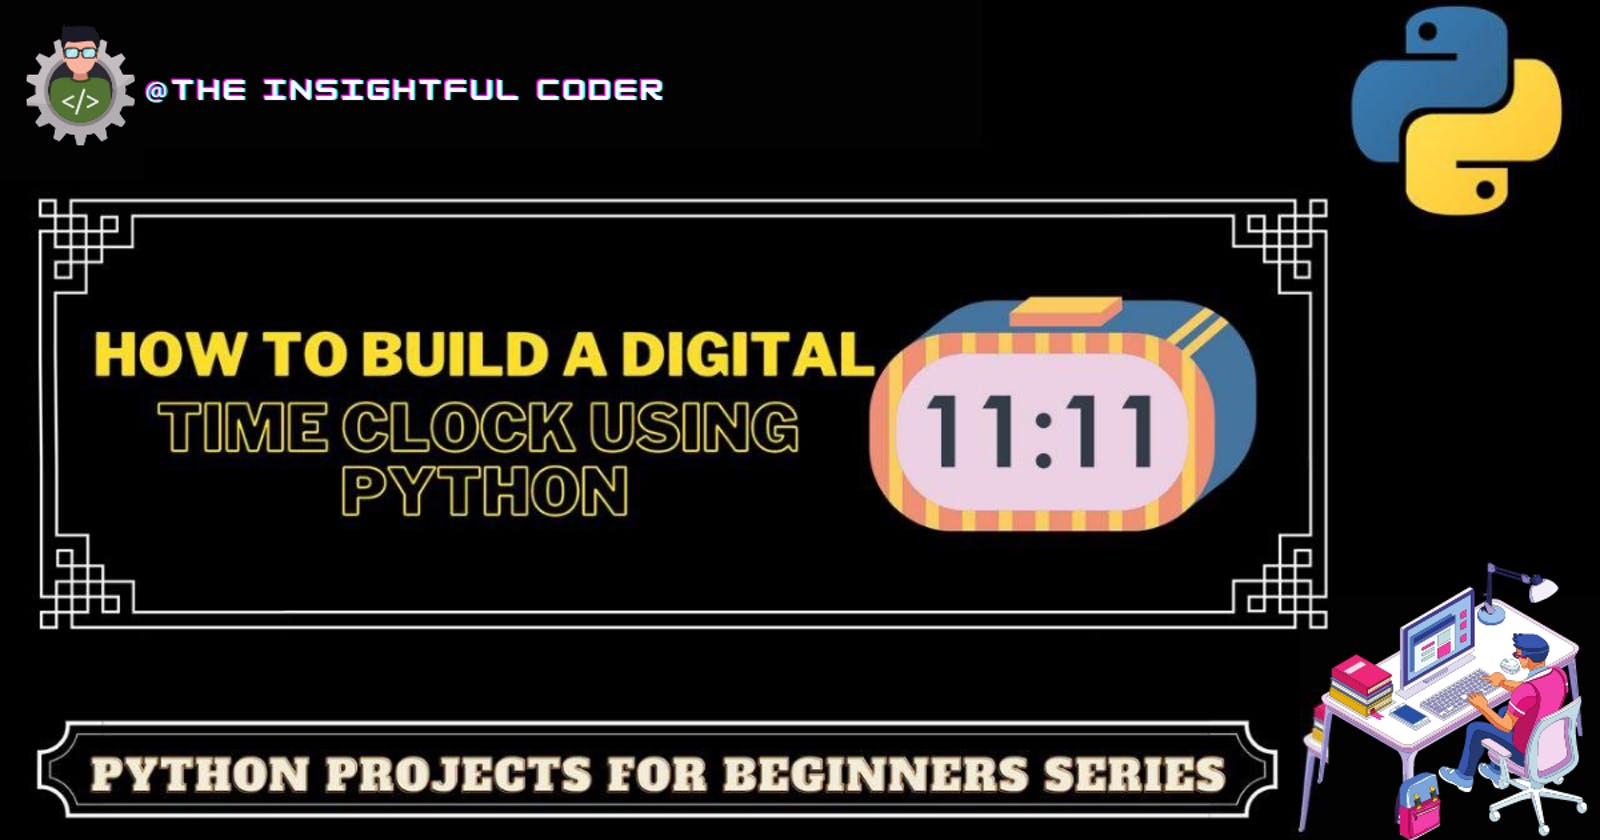 How to Build a Digital Time Clock Using Python